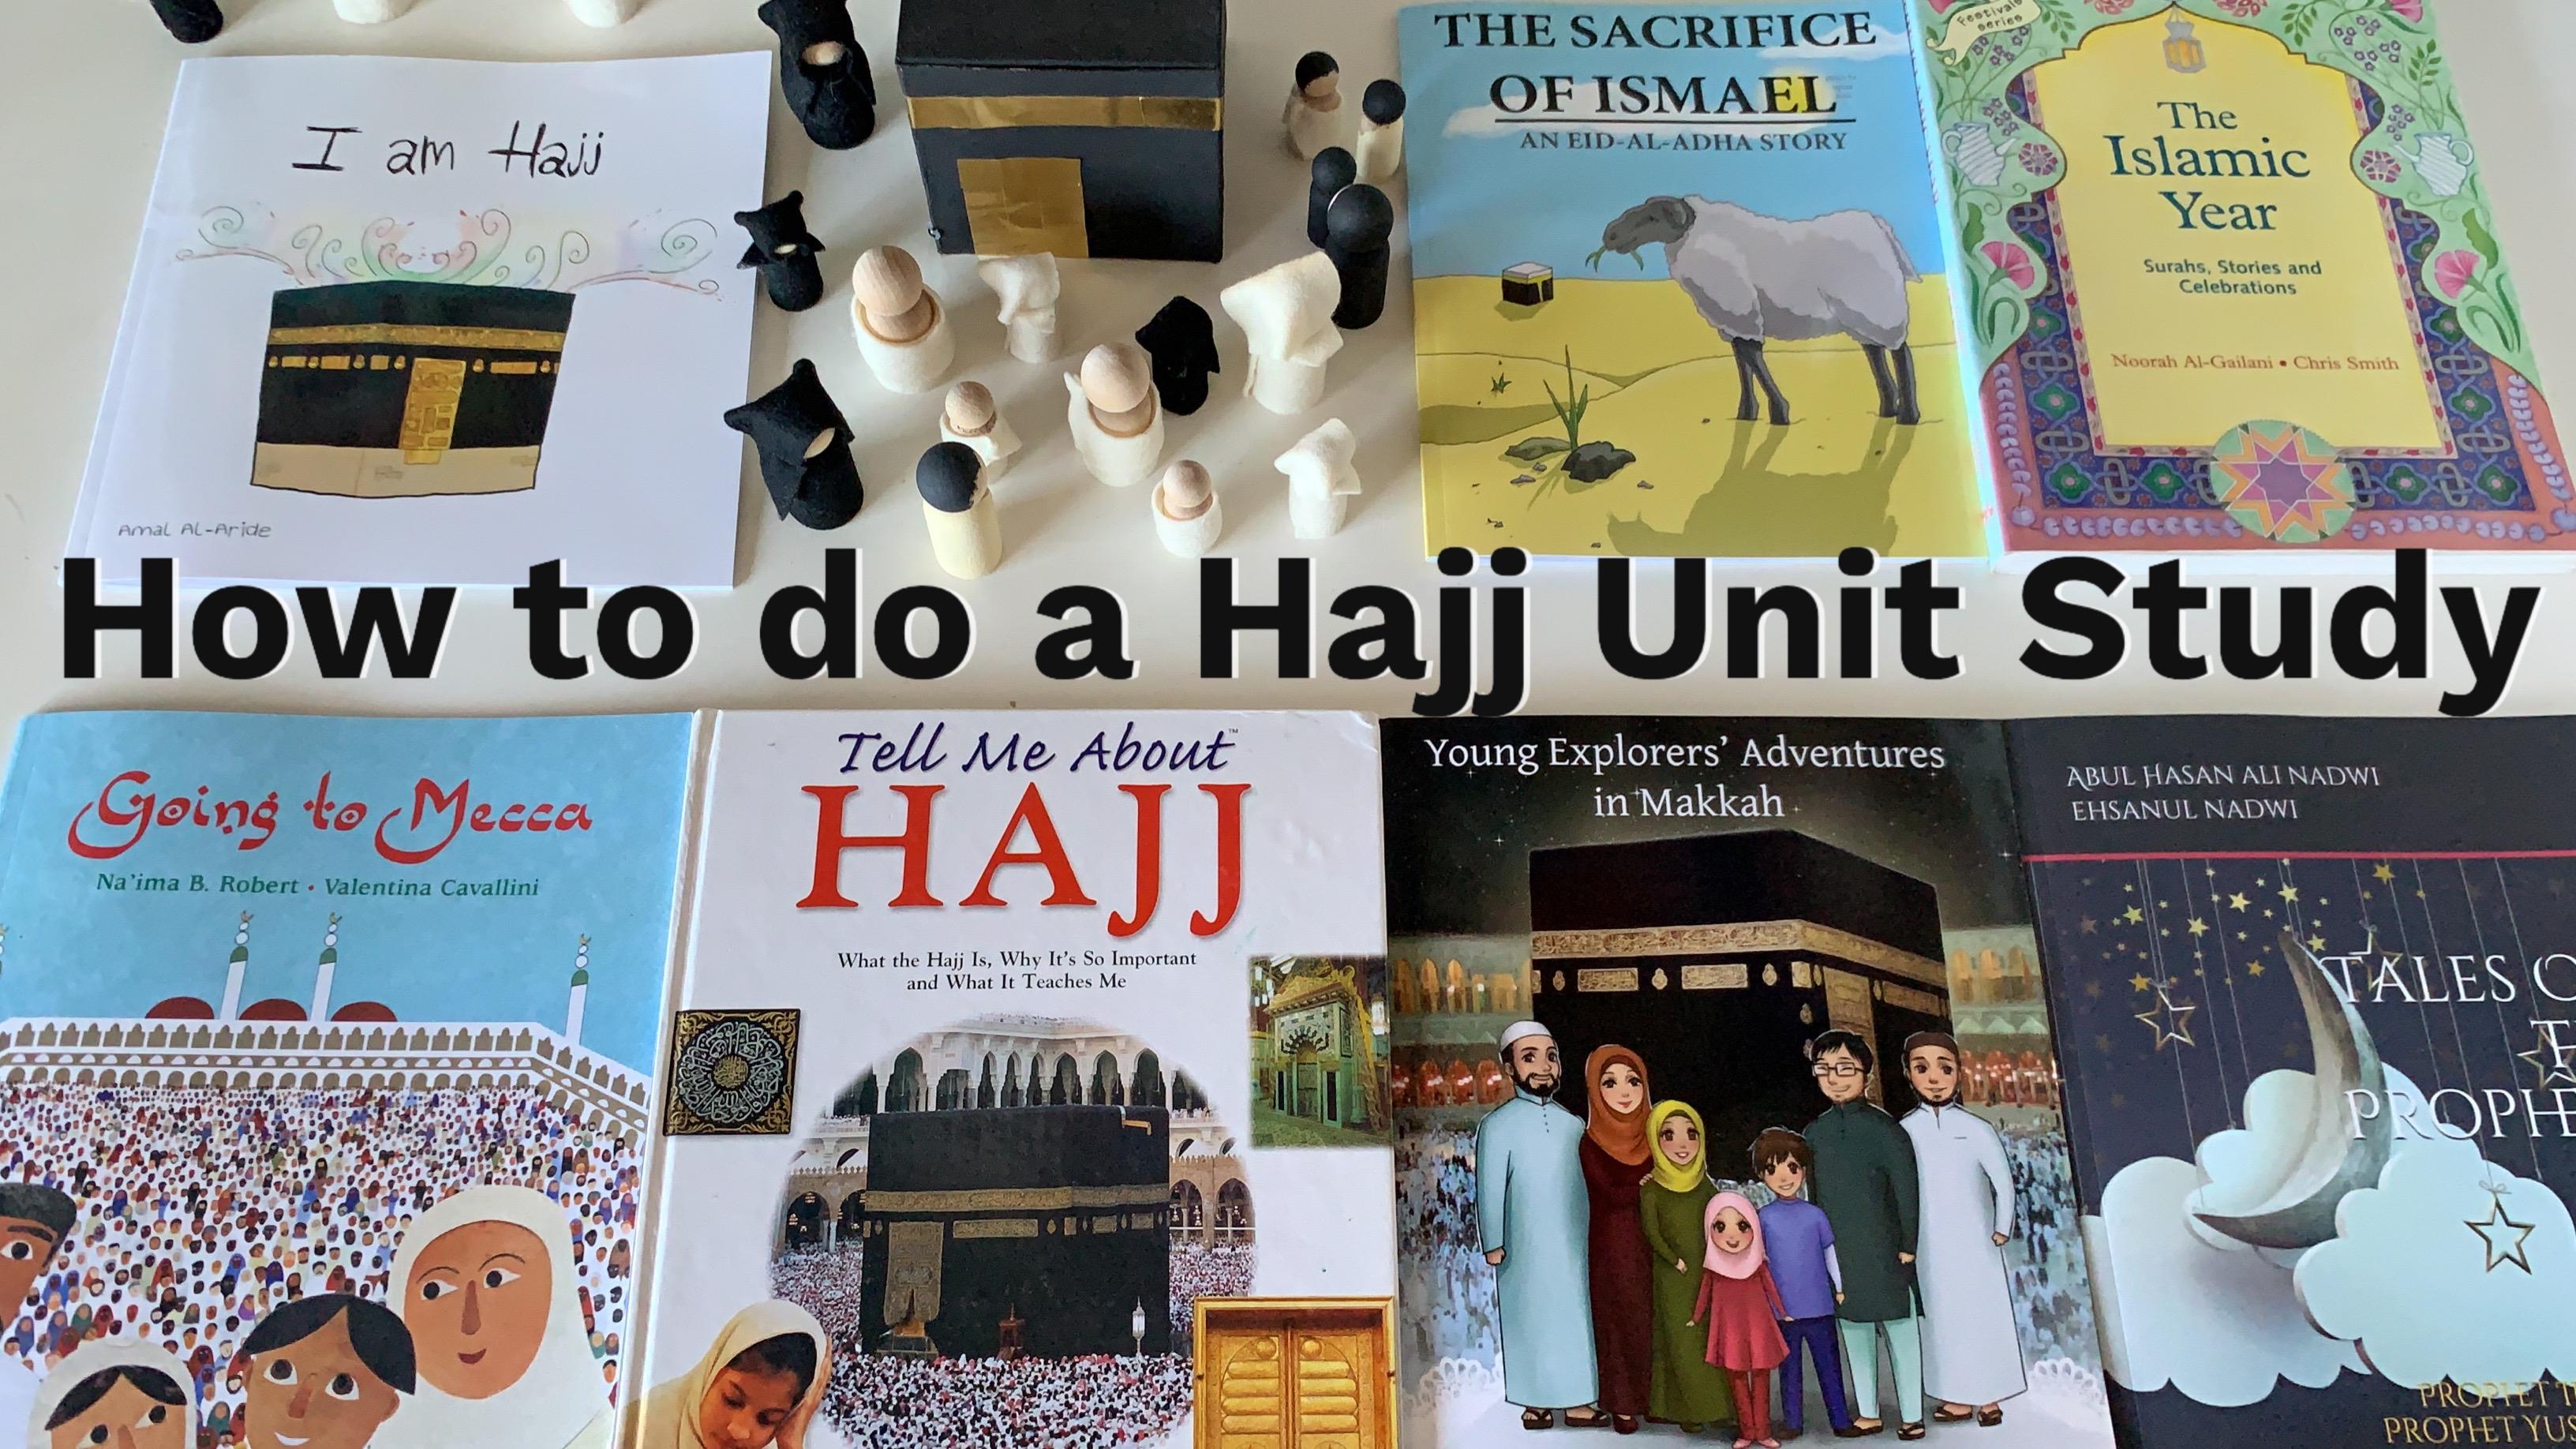 Hajj Unit Study